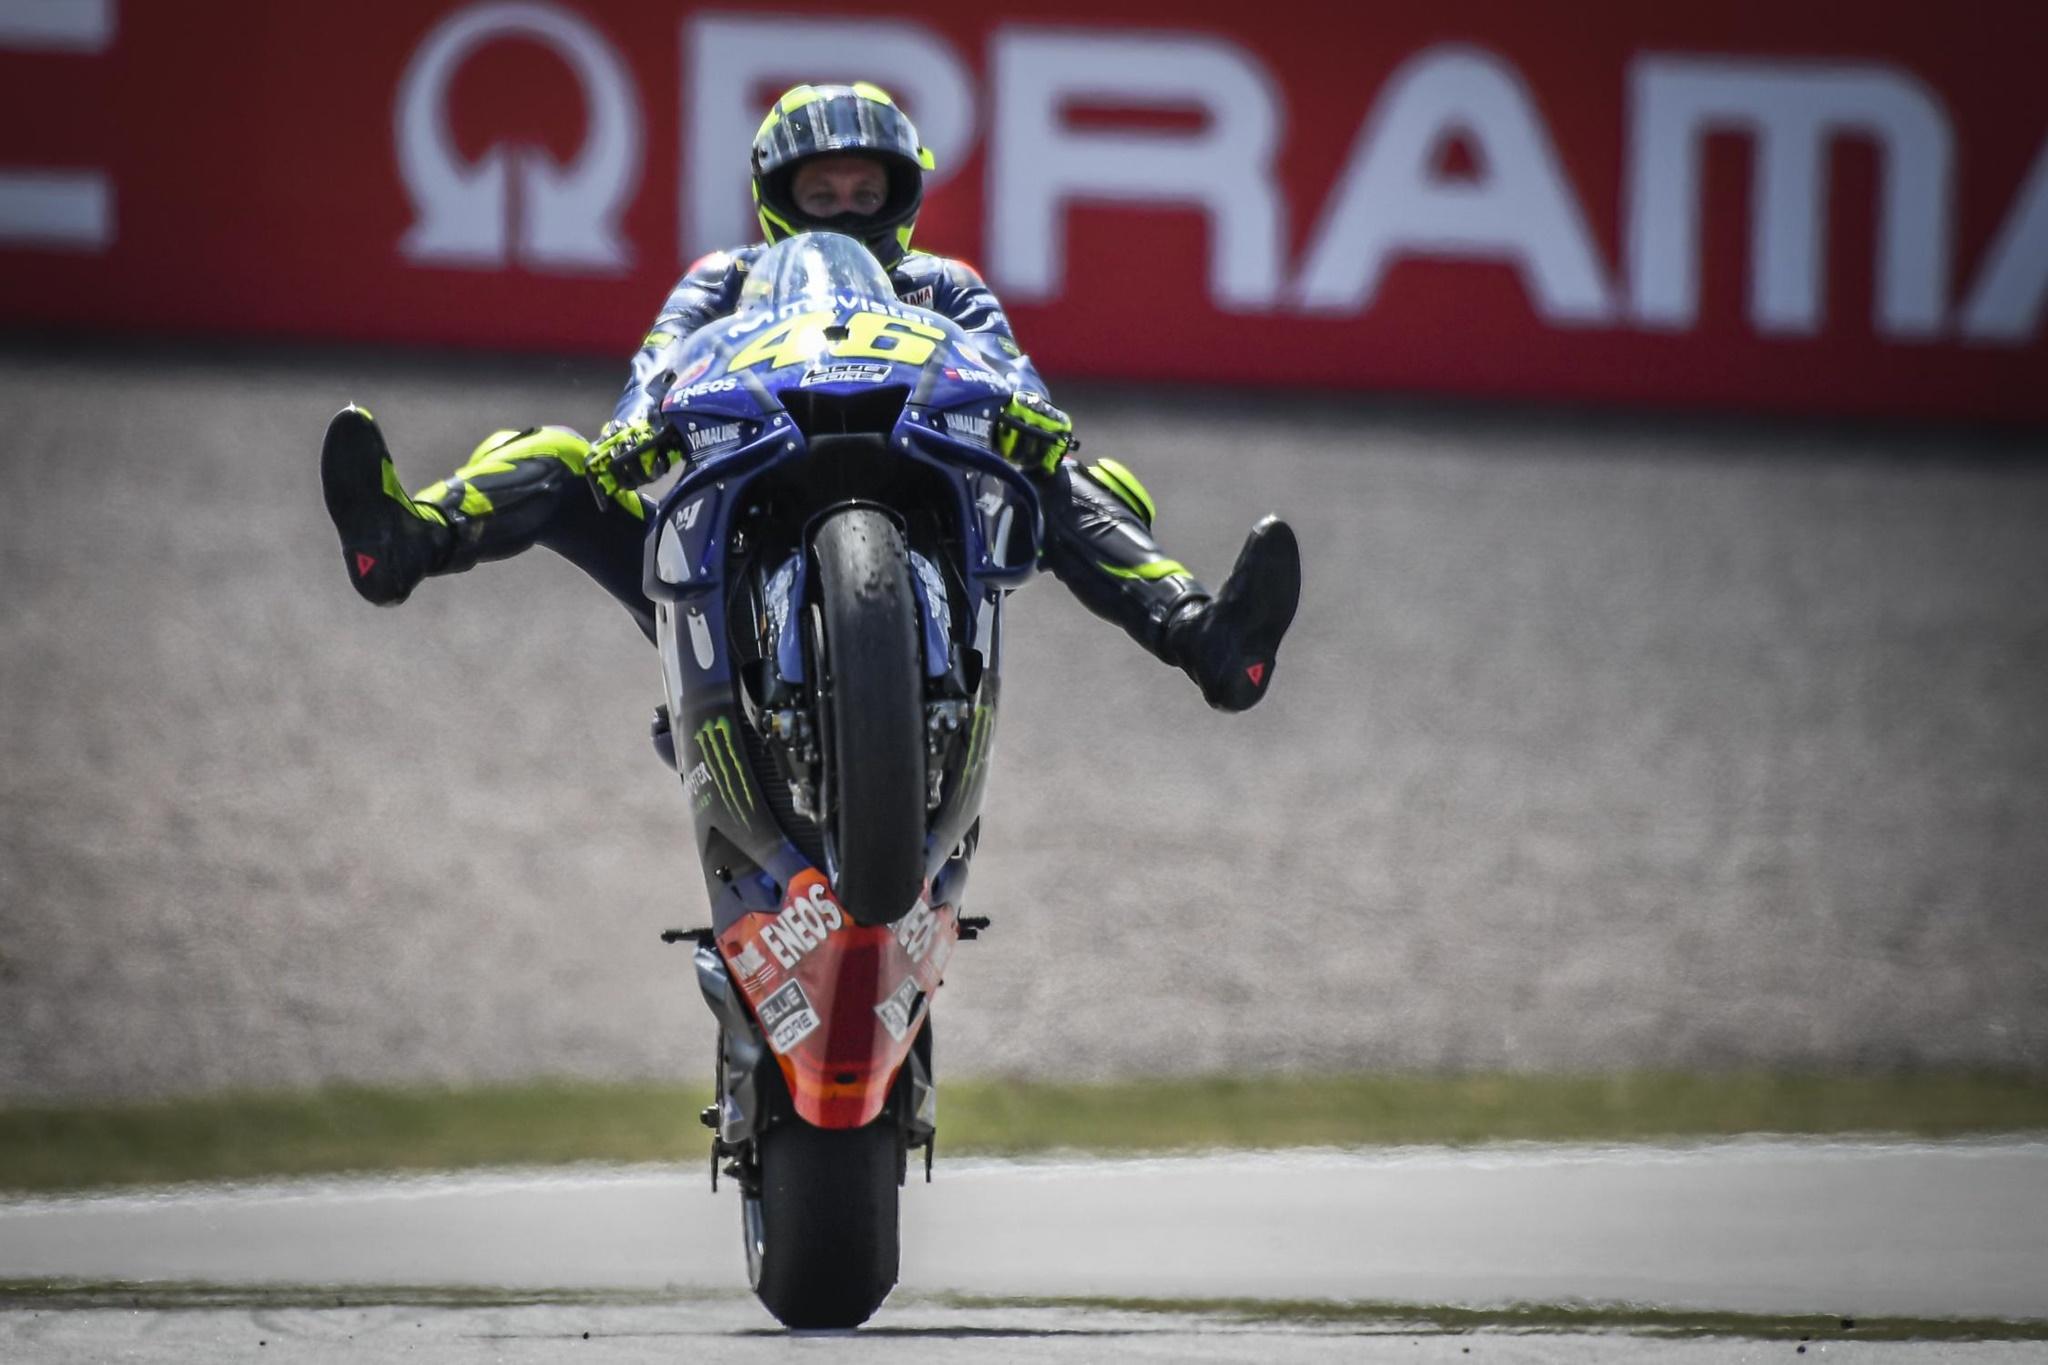 MotoGP18_GermanGP_2018_Xe_Tinhte-020.jpg